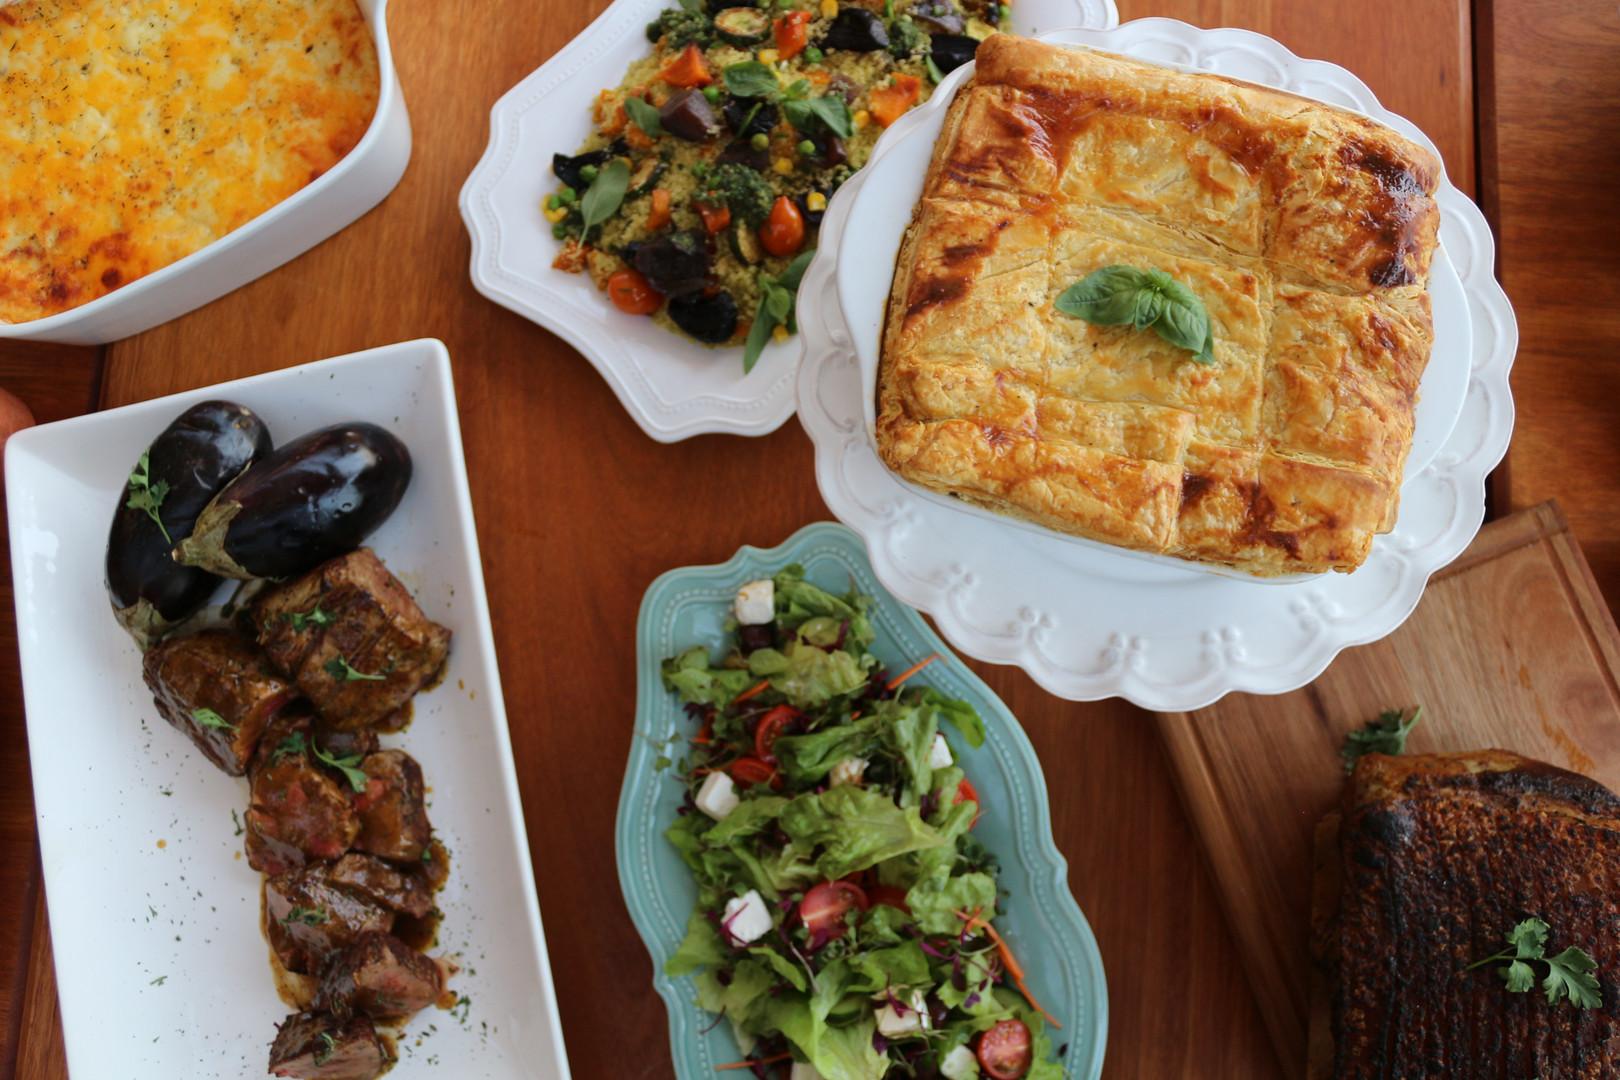 Food platter 4 at Carmella's.JPG